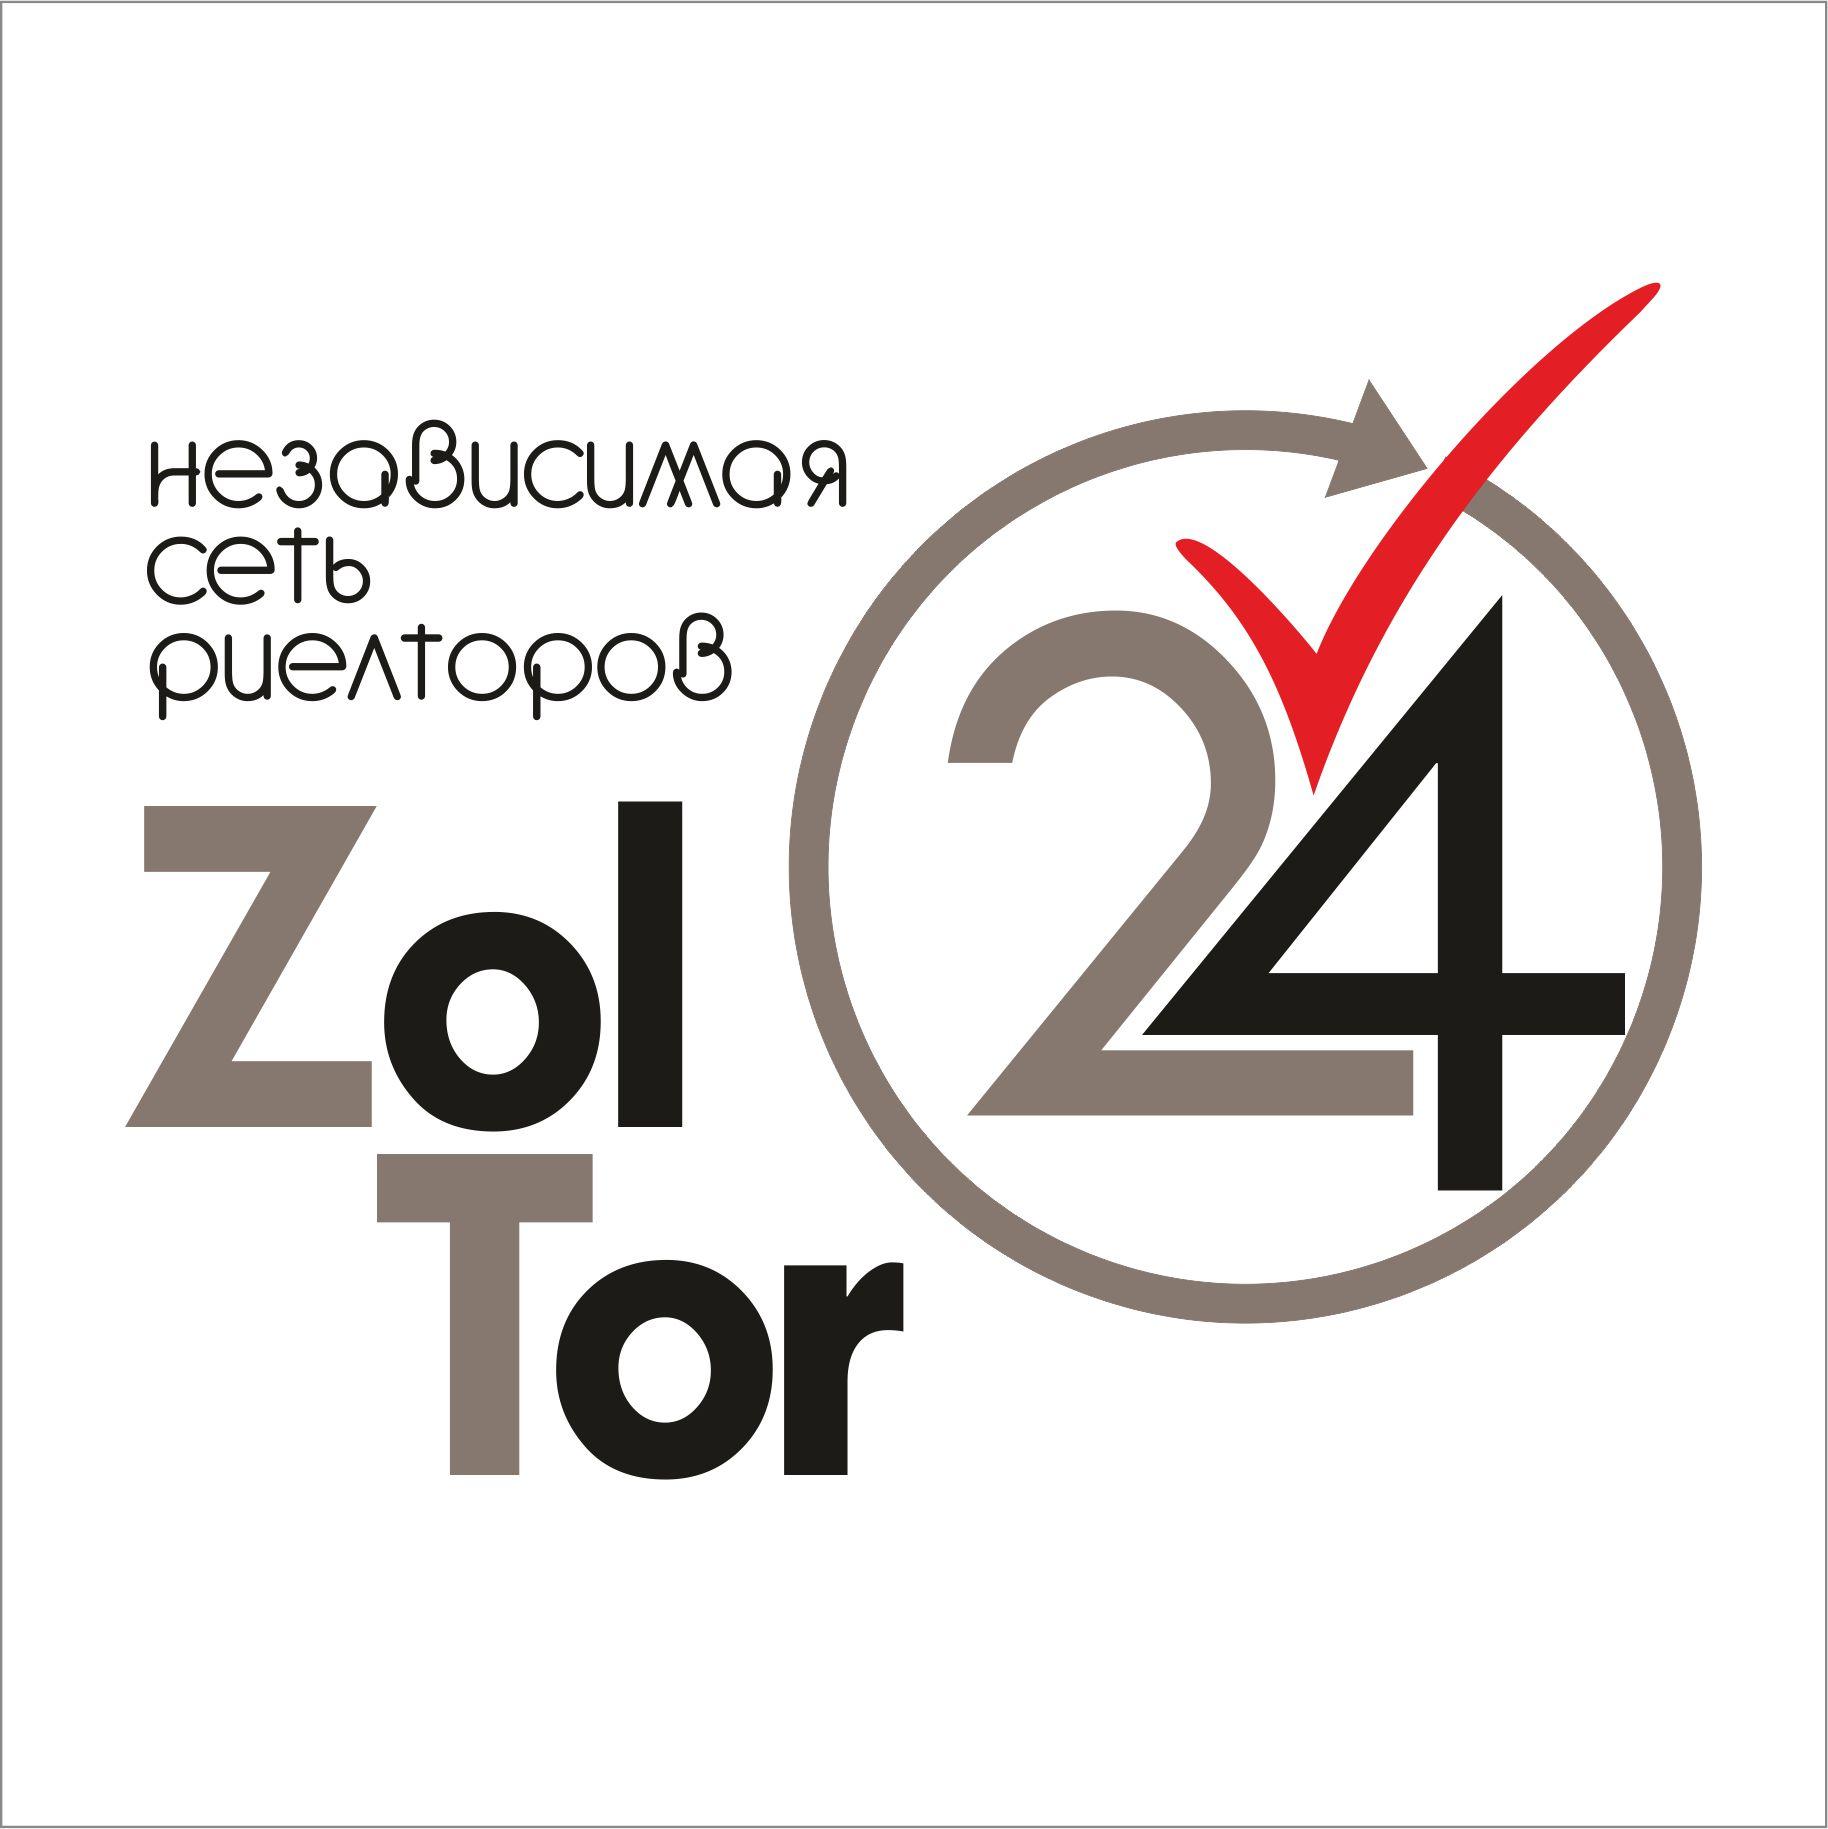 Логотип и фирменный стиль ZolTor24 фото f_9445c87b9bdf0896.jpg